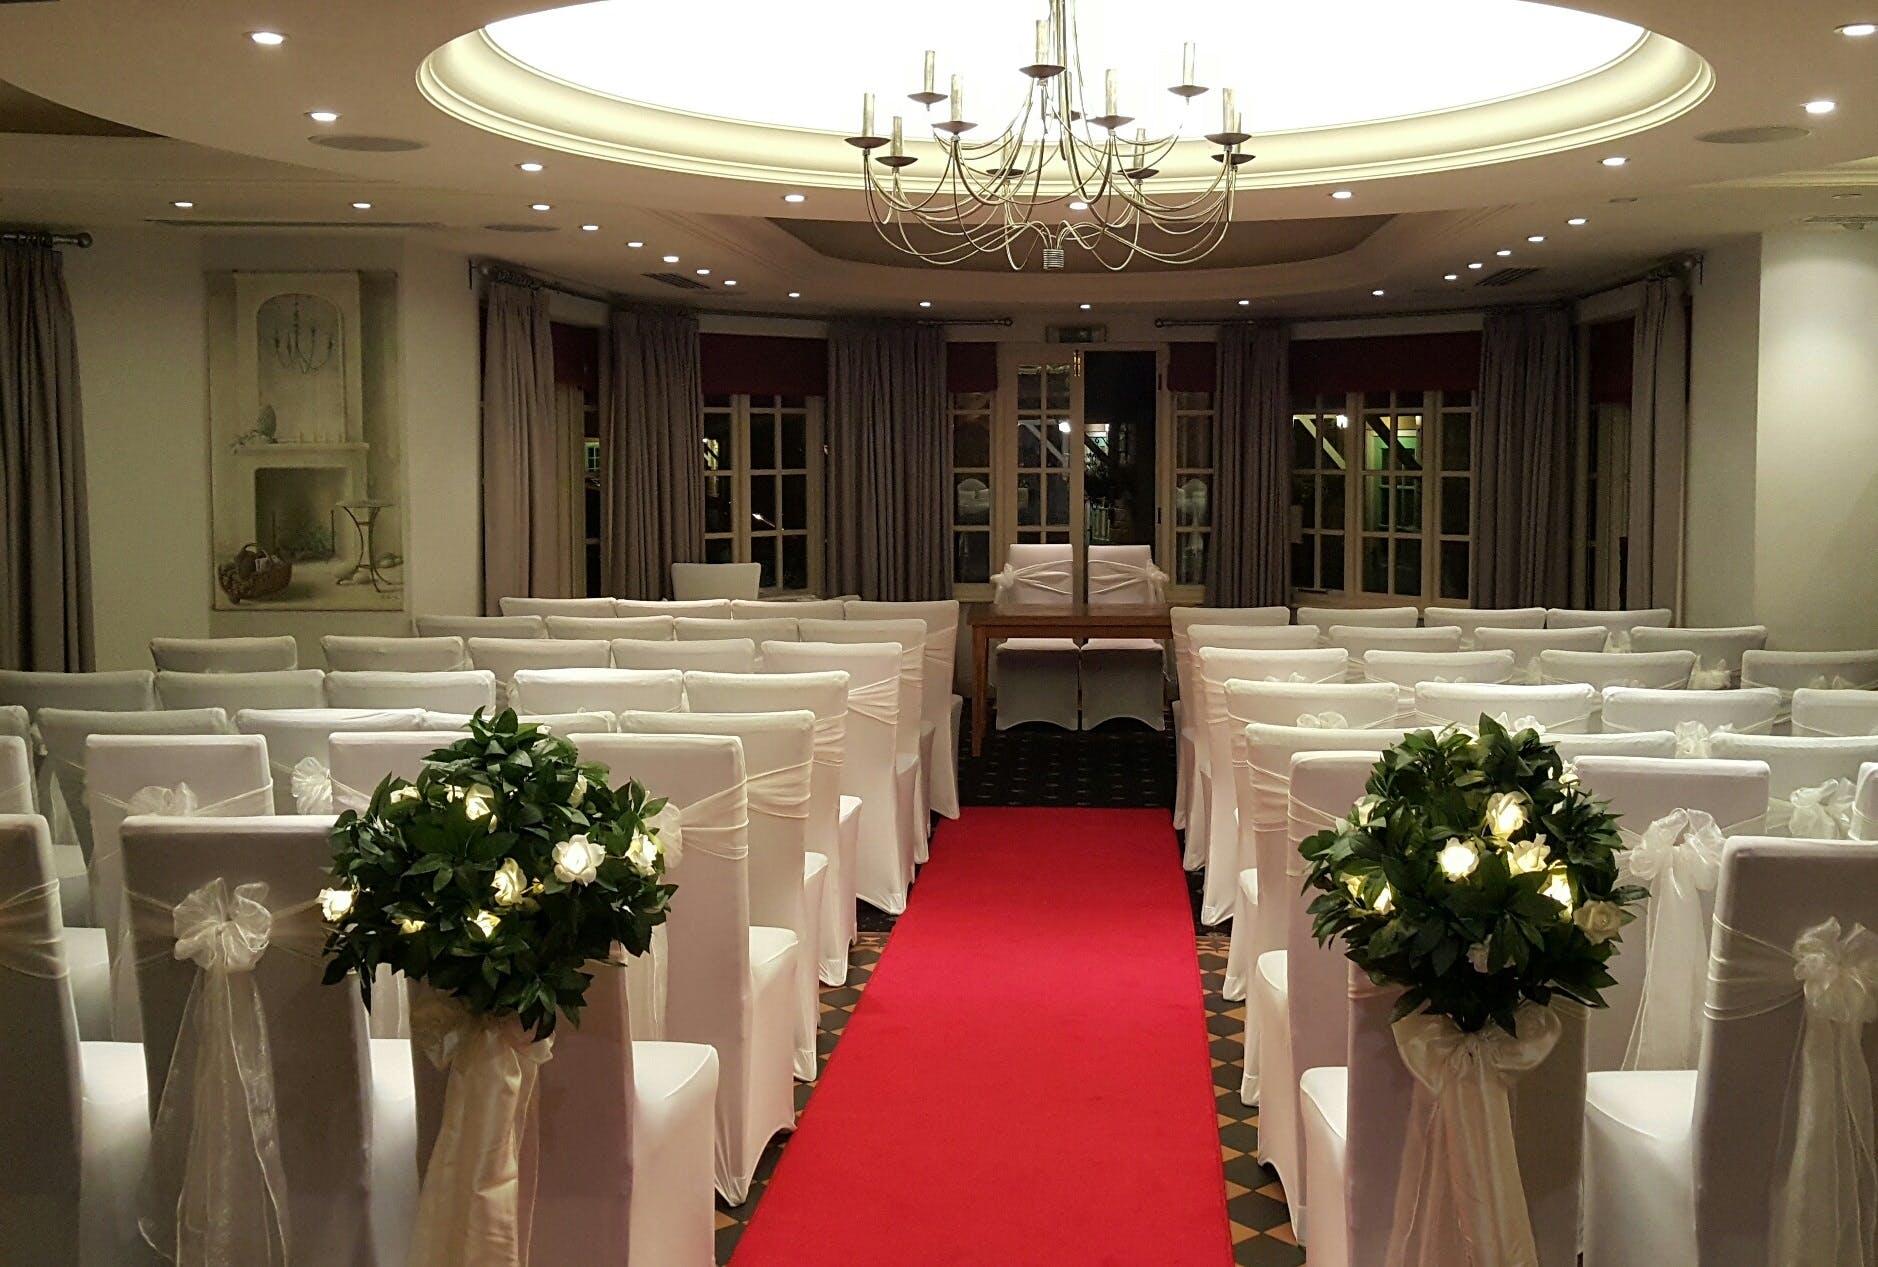 Garden Room Ready For Wedding Ceremony